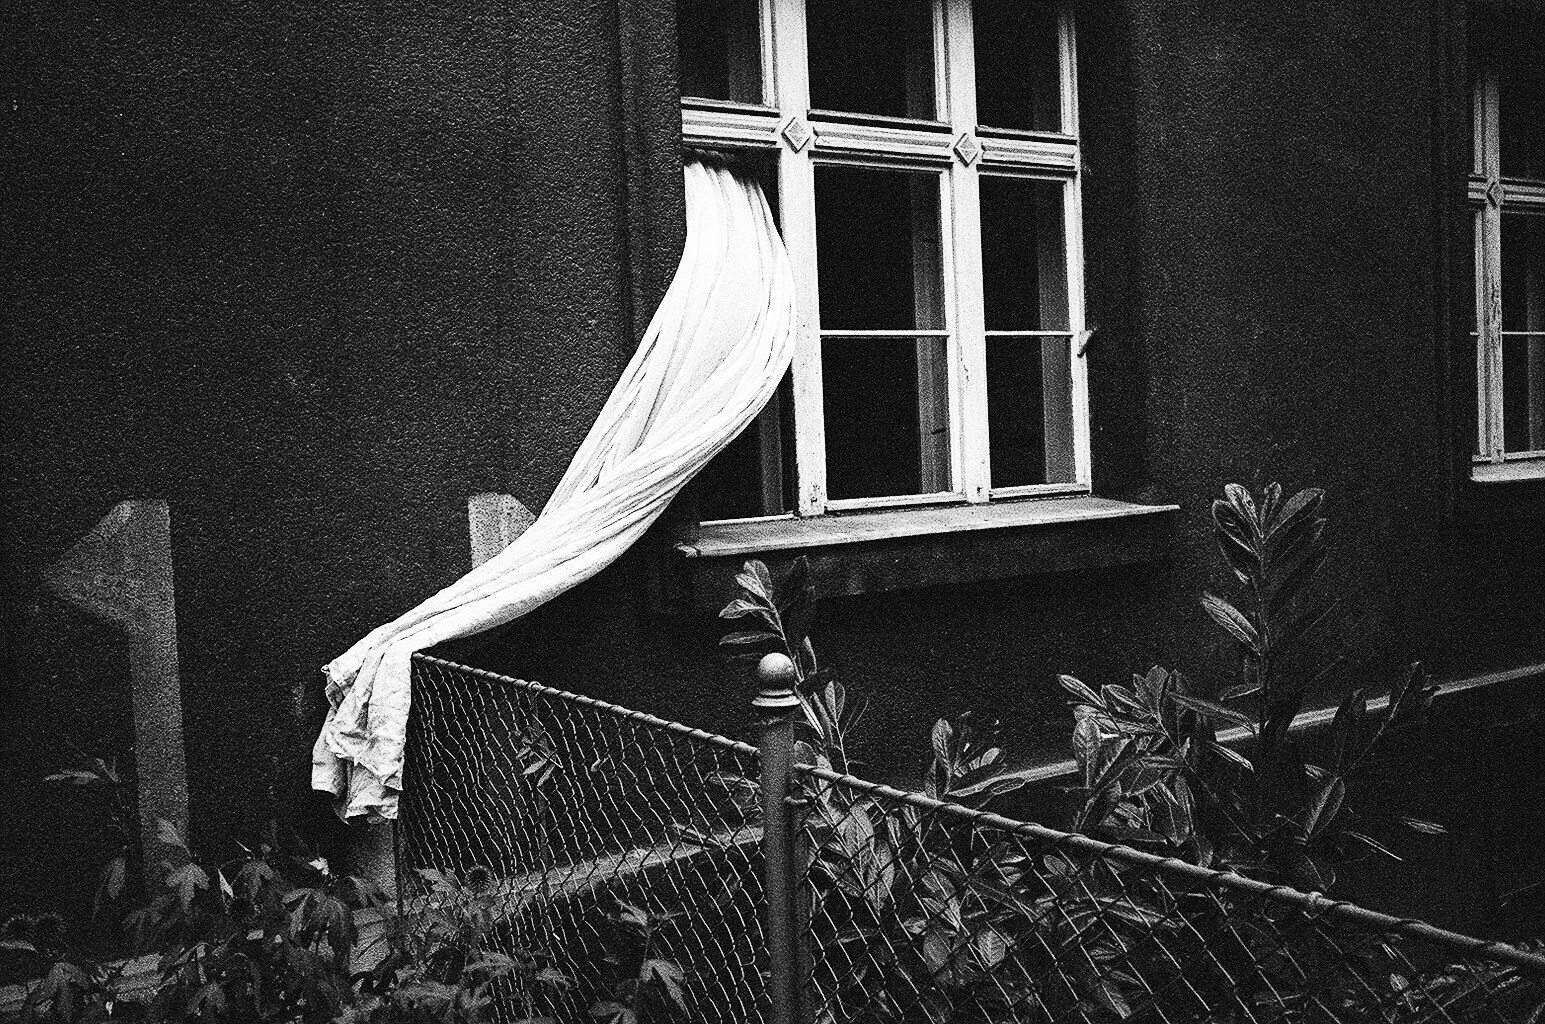 prague-2015-trix-1600-film-window-curtain-eric-kim-street-photograpy-black-and-white-monochrome-15